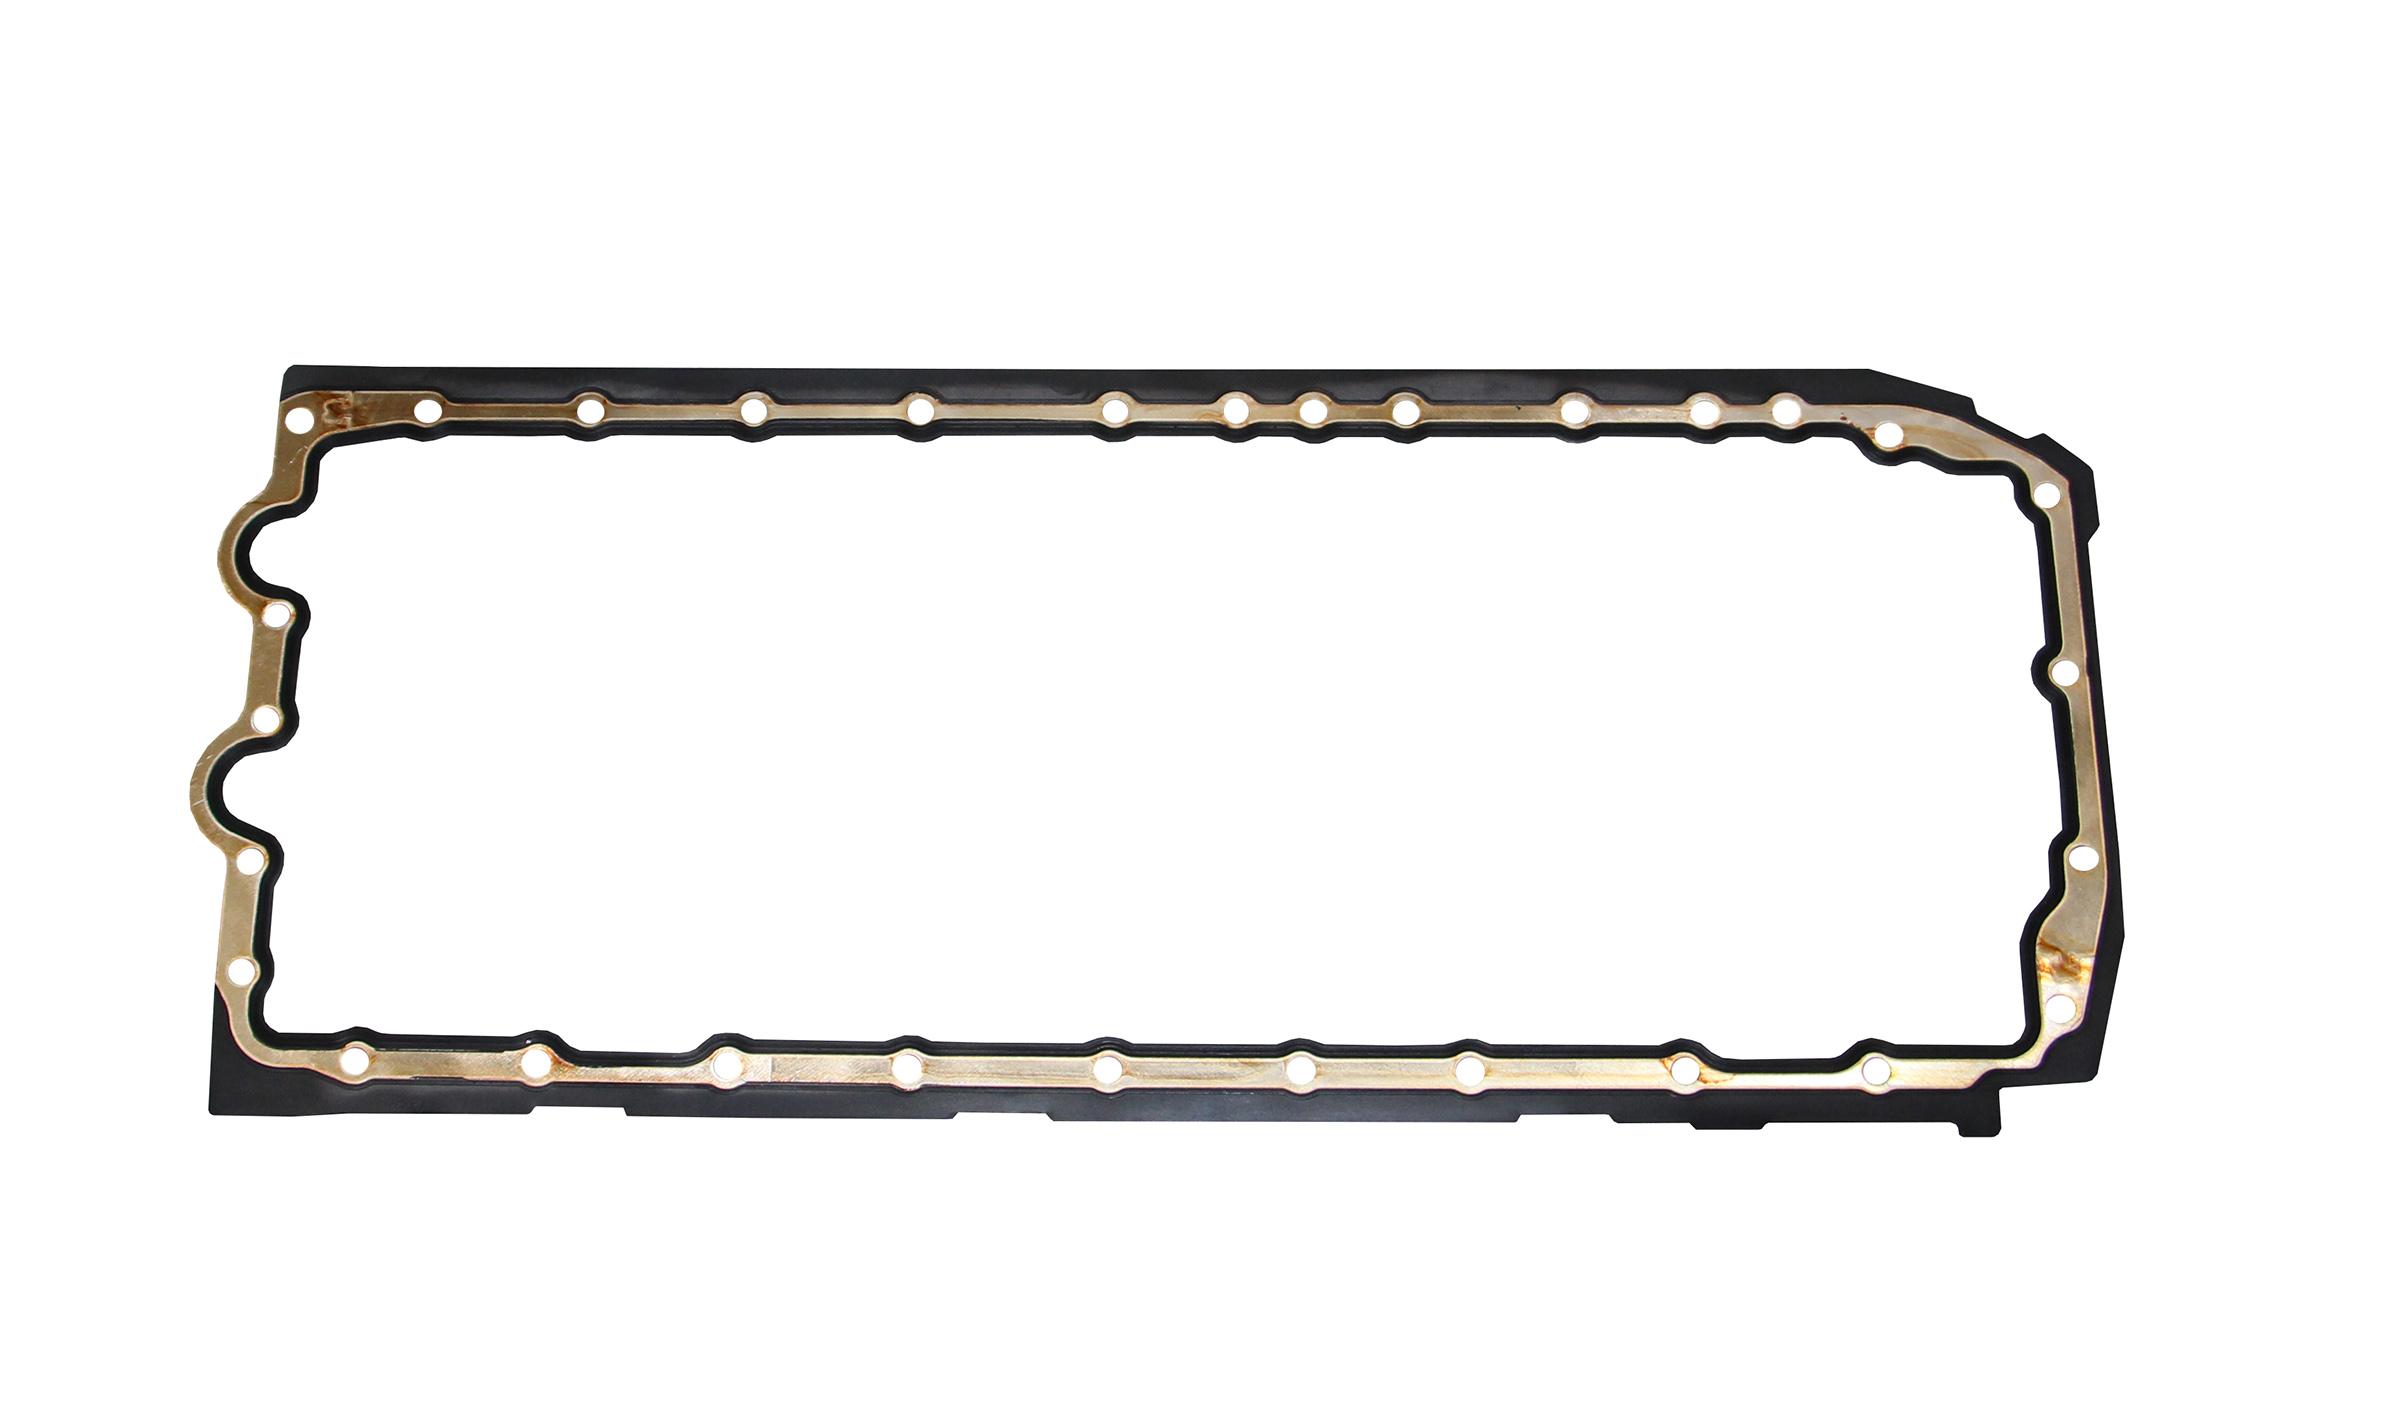 alleuro com: Ajusa Engine Oil Pan Gasket 11137600482